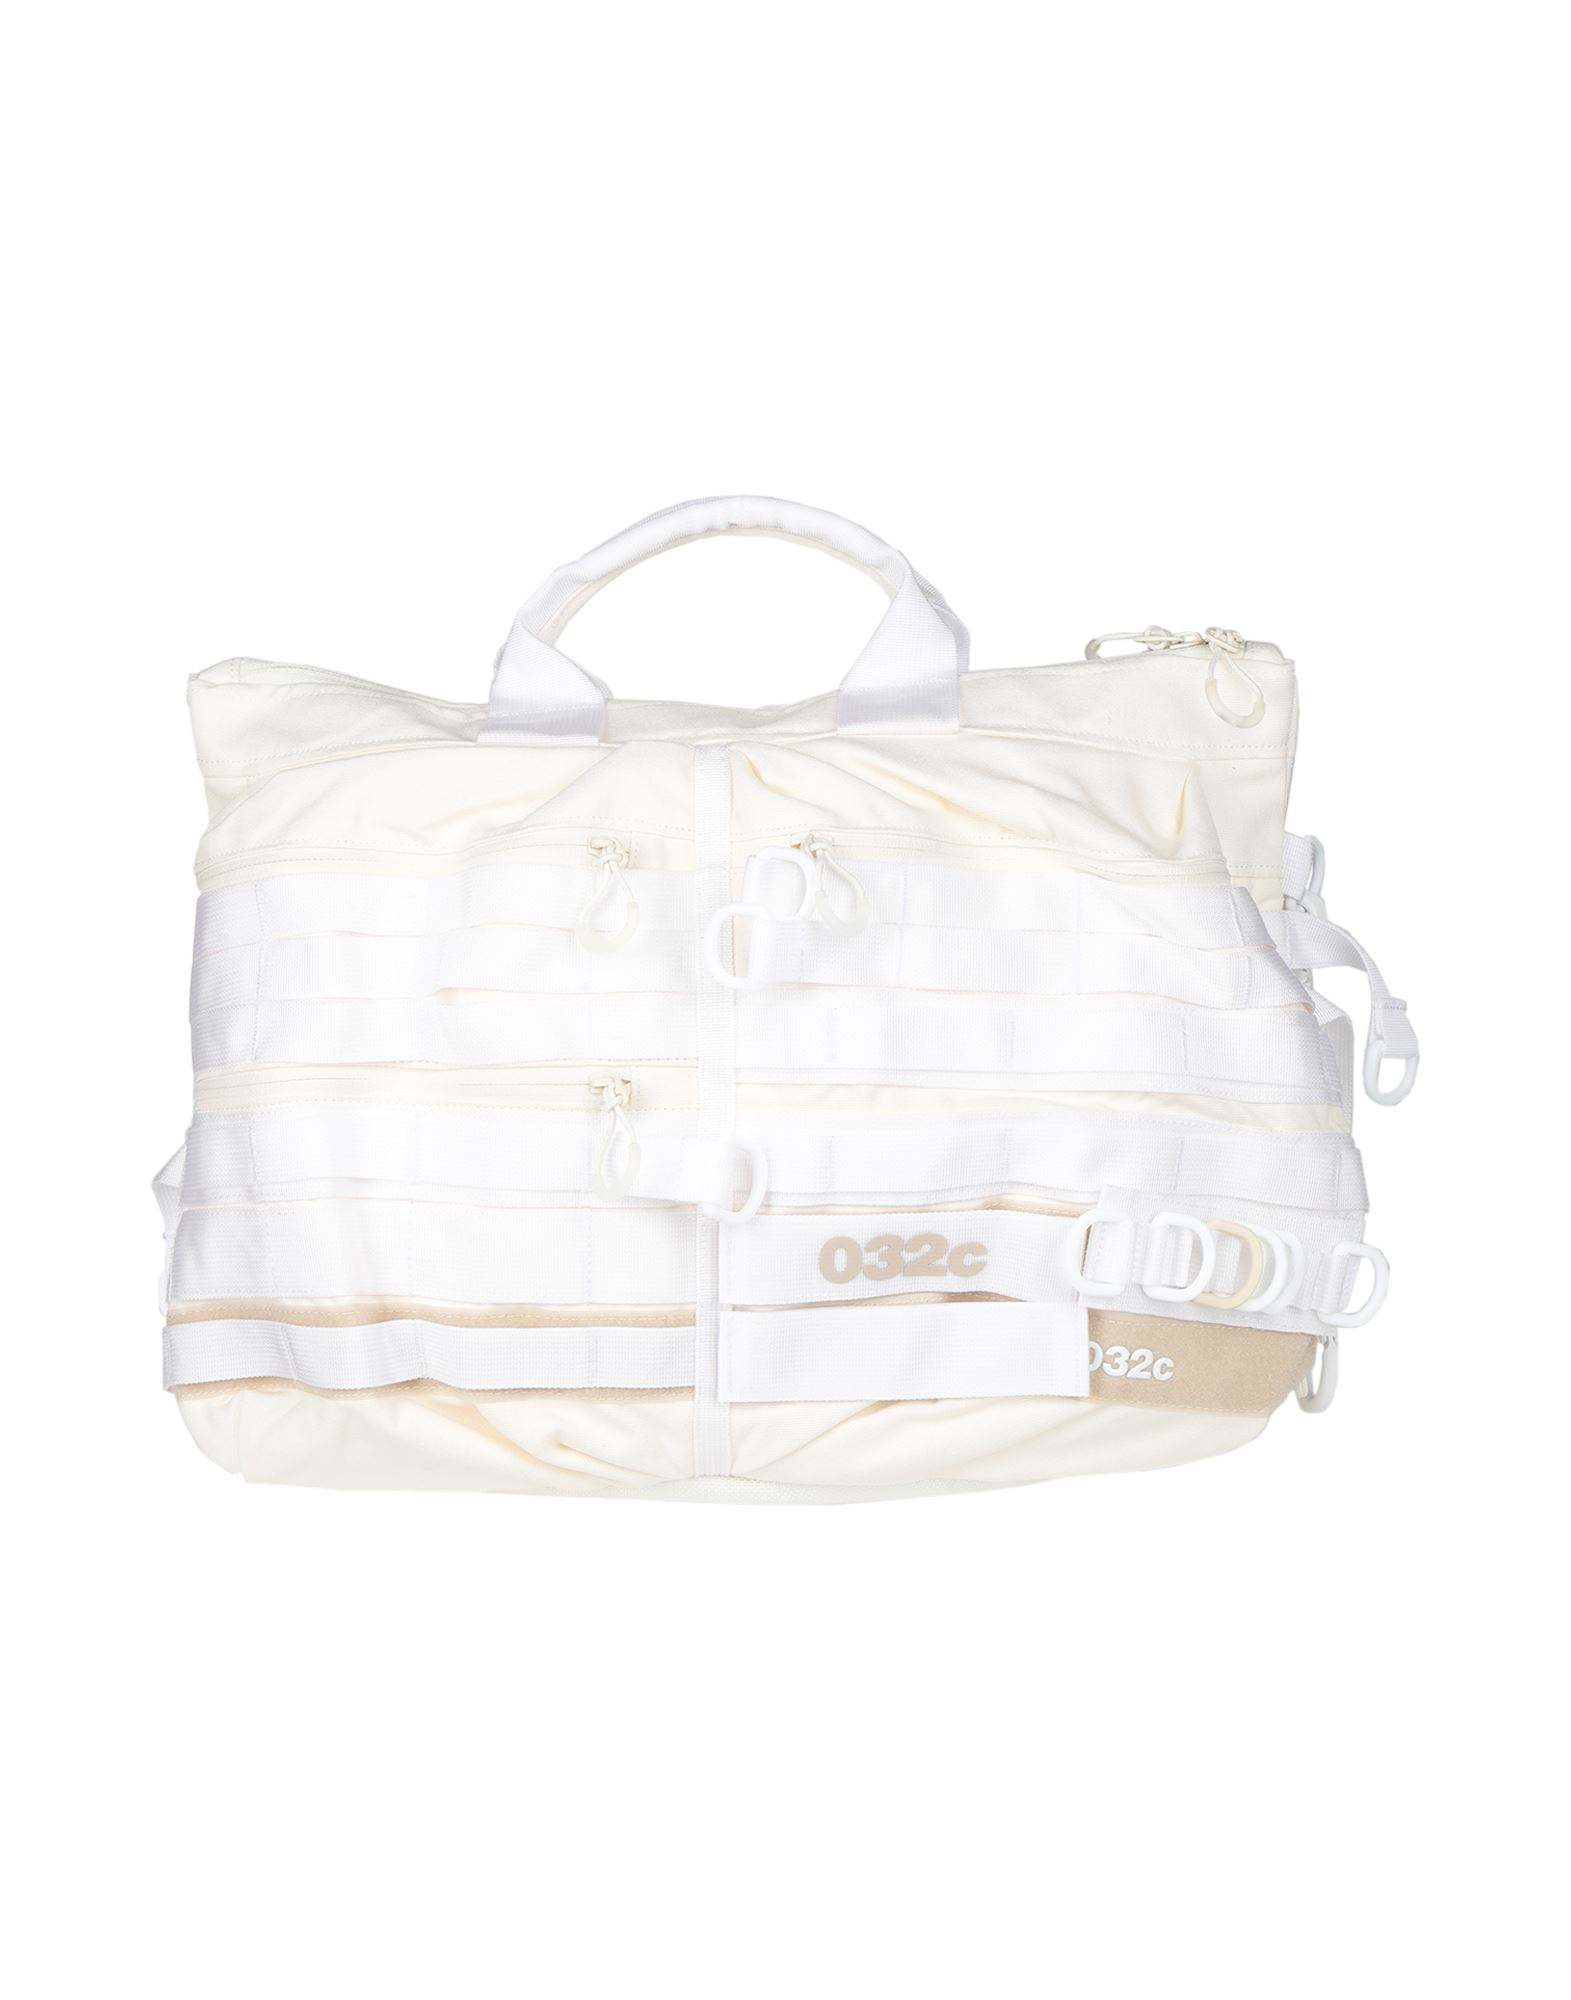 Adidas By 032c Travel Duffel Bags In Multi